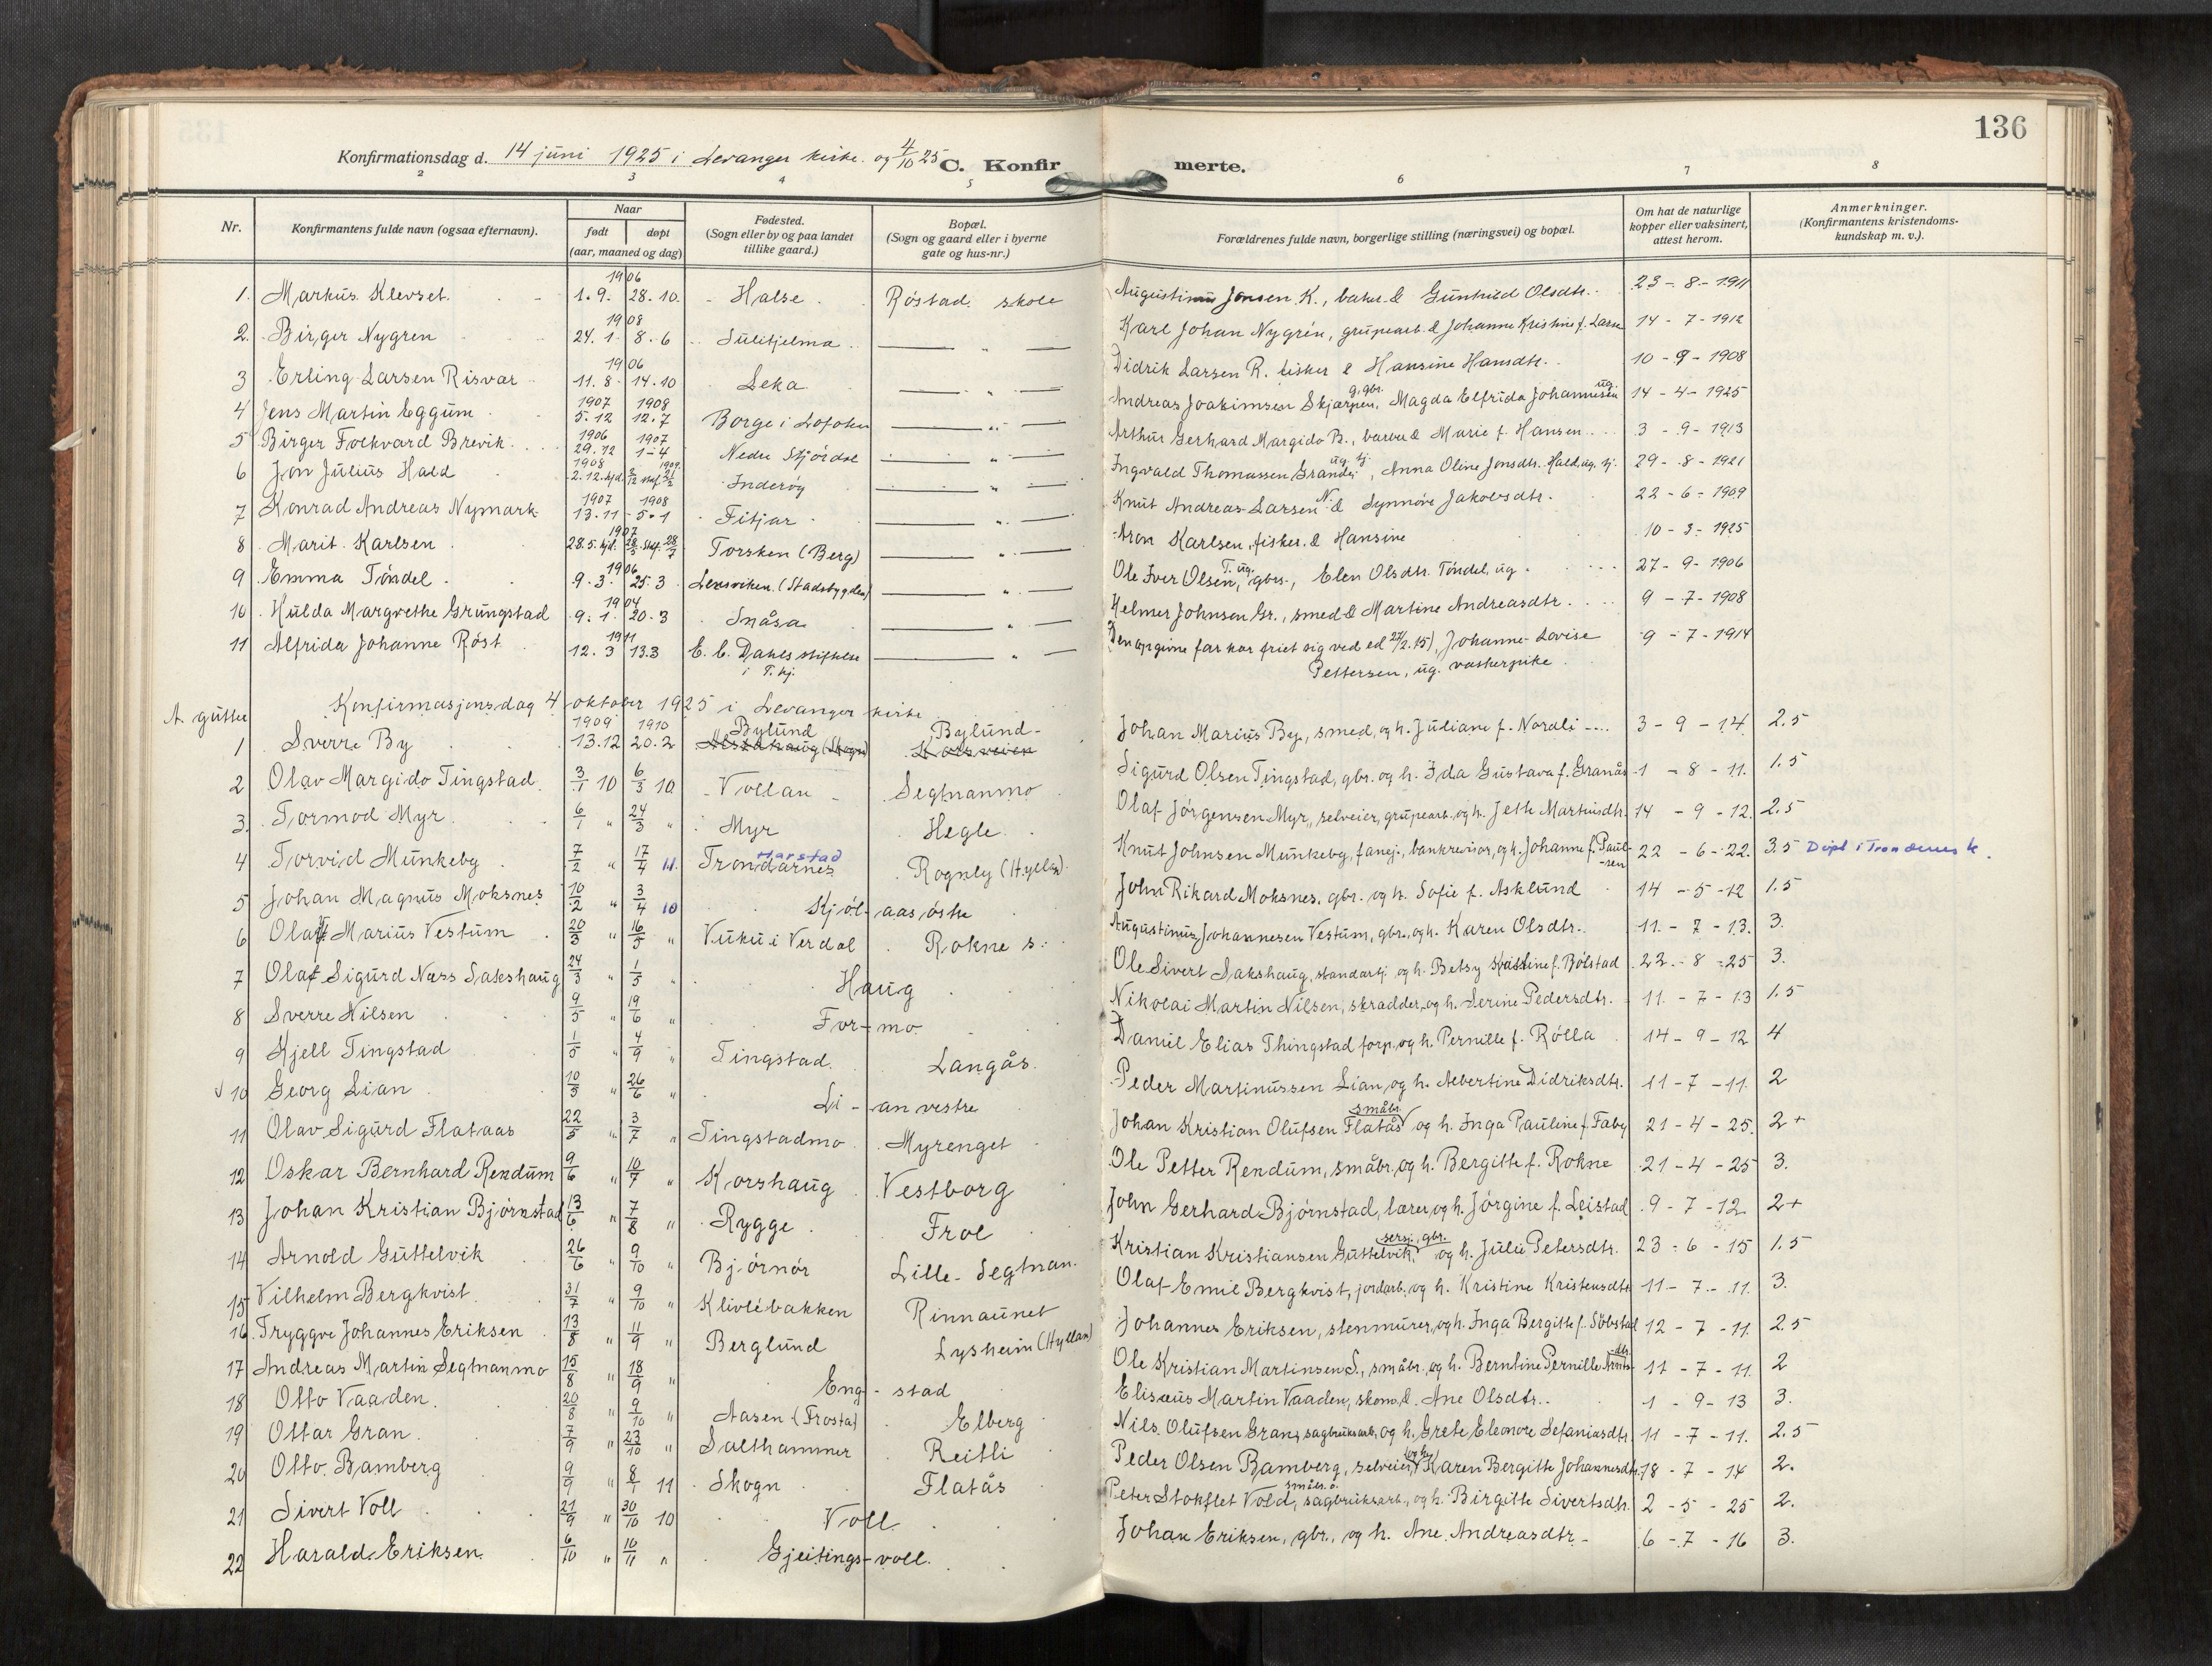 SAT, Levanger sokneprestkontor*, Parish register (official) no. 1, 1912-1935, p. 136